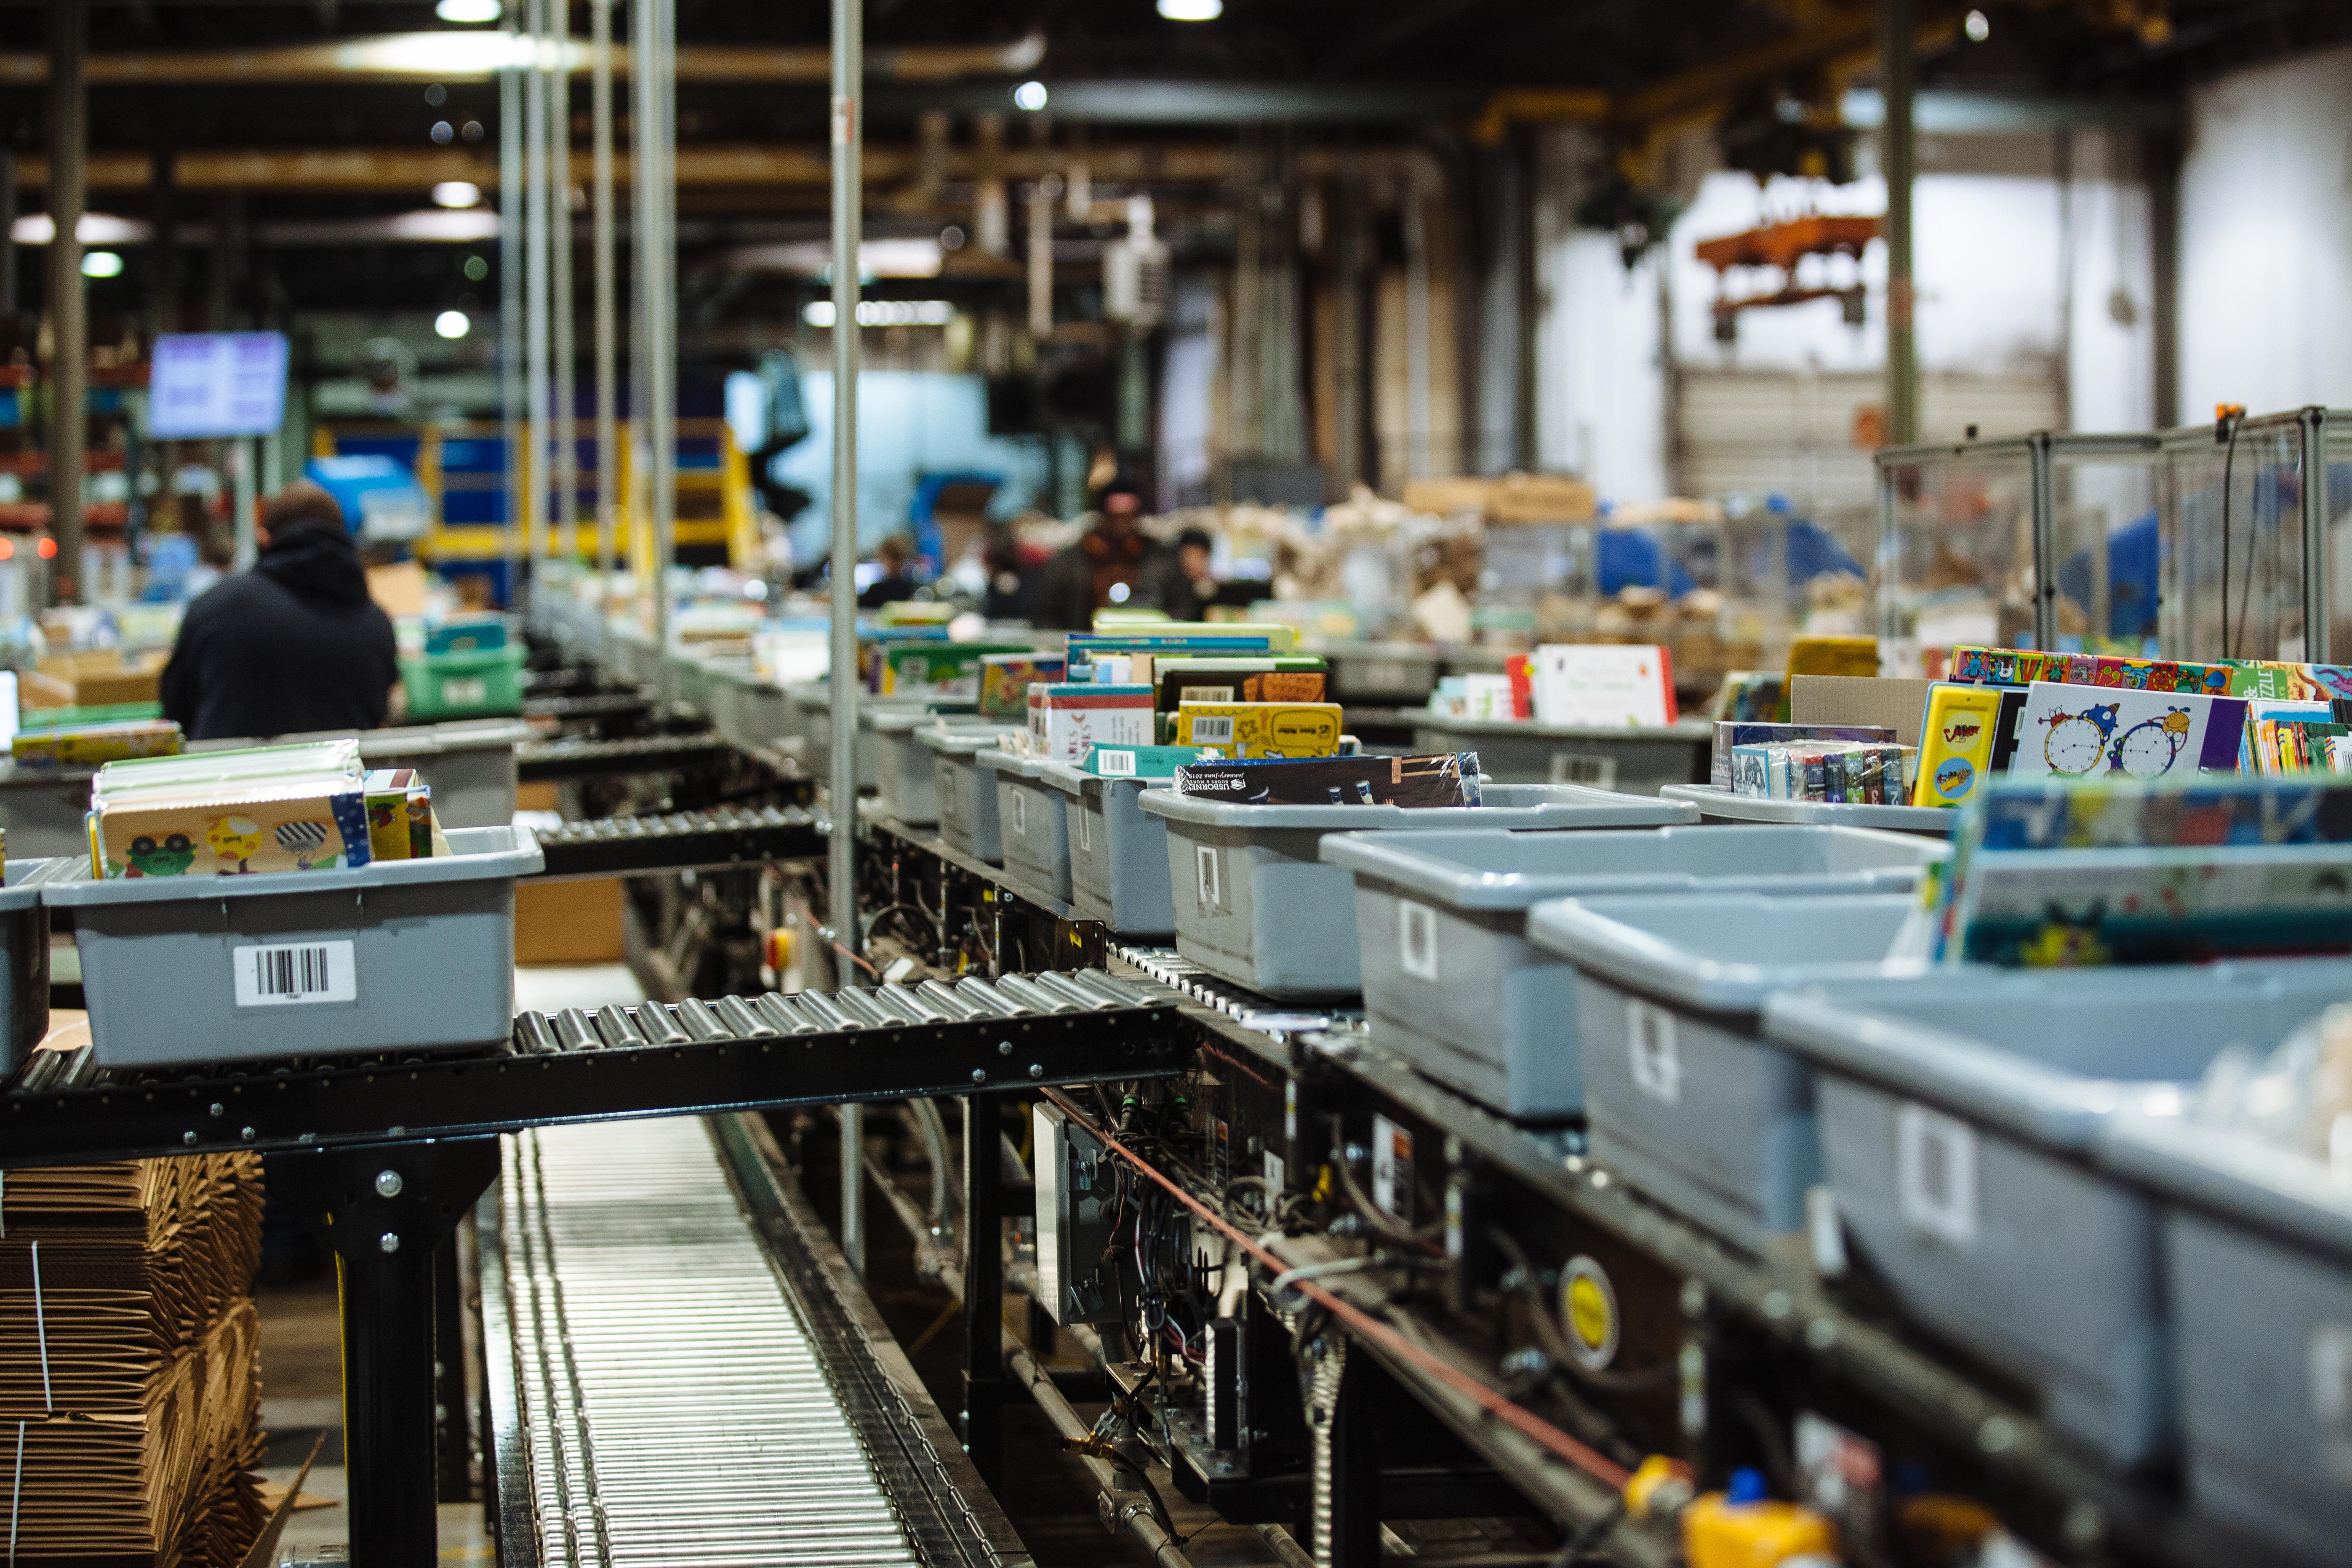 EDC divert system utilizing Hytrol conveyors.